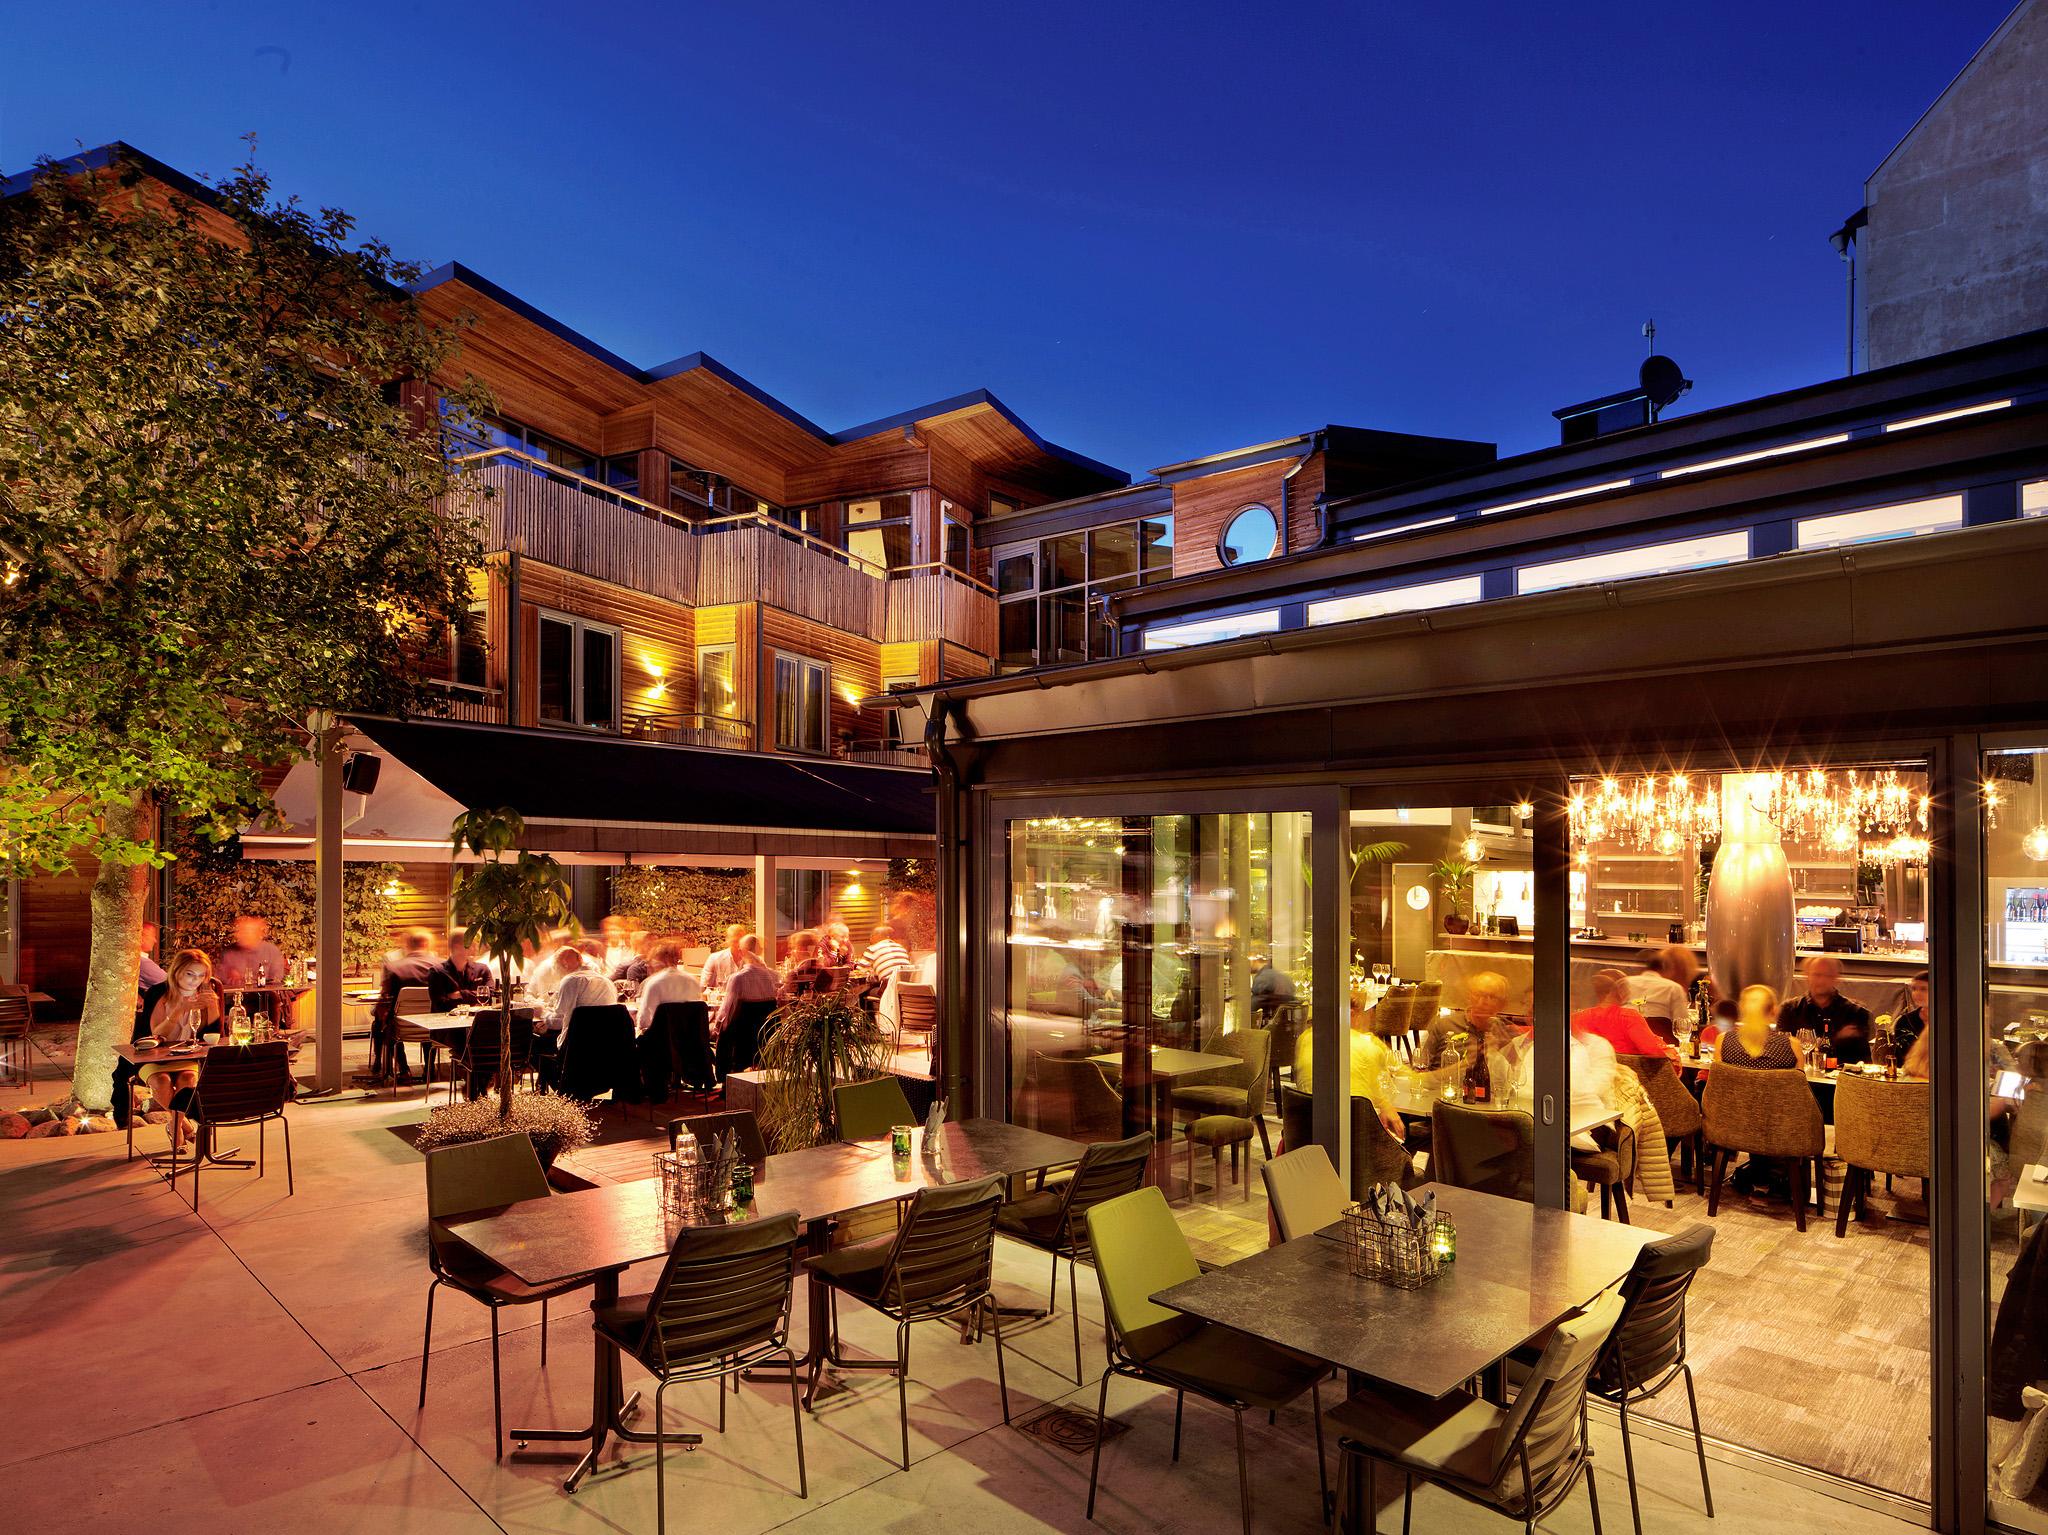 150829 KvŠllsstŠmning i restaurangen pŒ The Lamp Hotel den 29 augusti 2015 i Norrkšping. Foto: Peter Holgersson AB